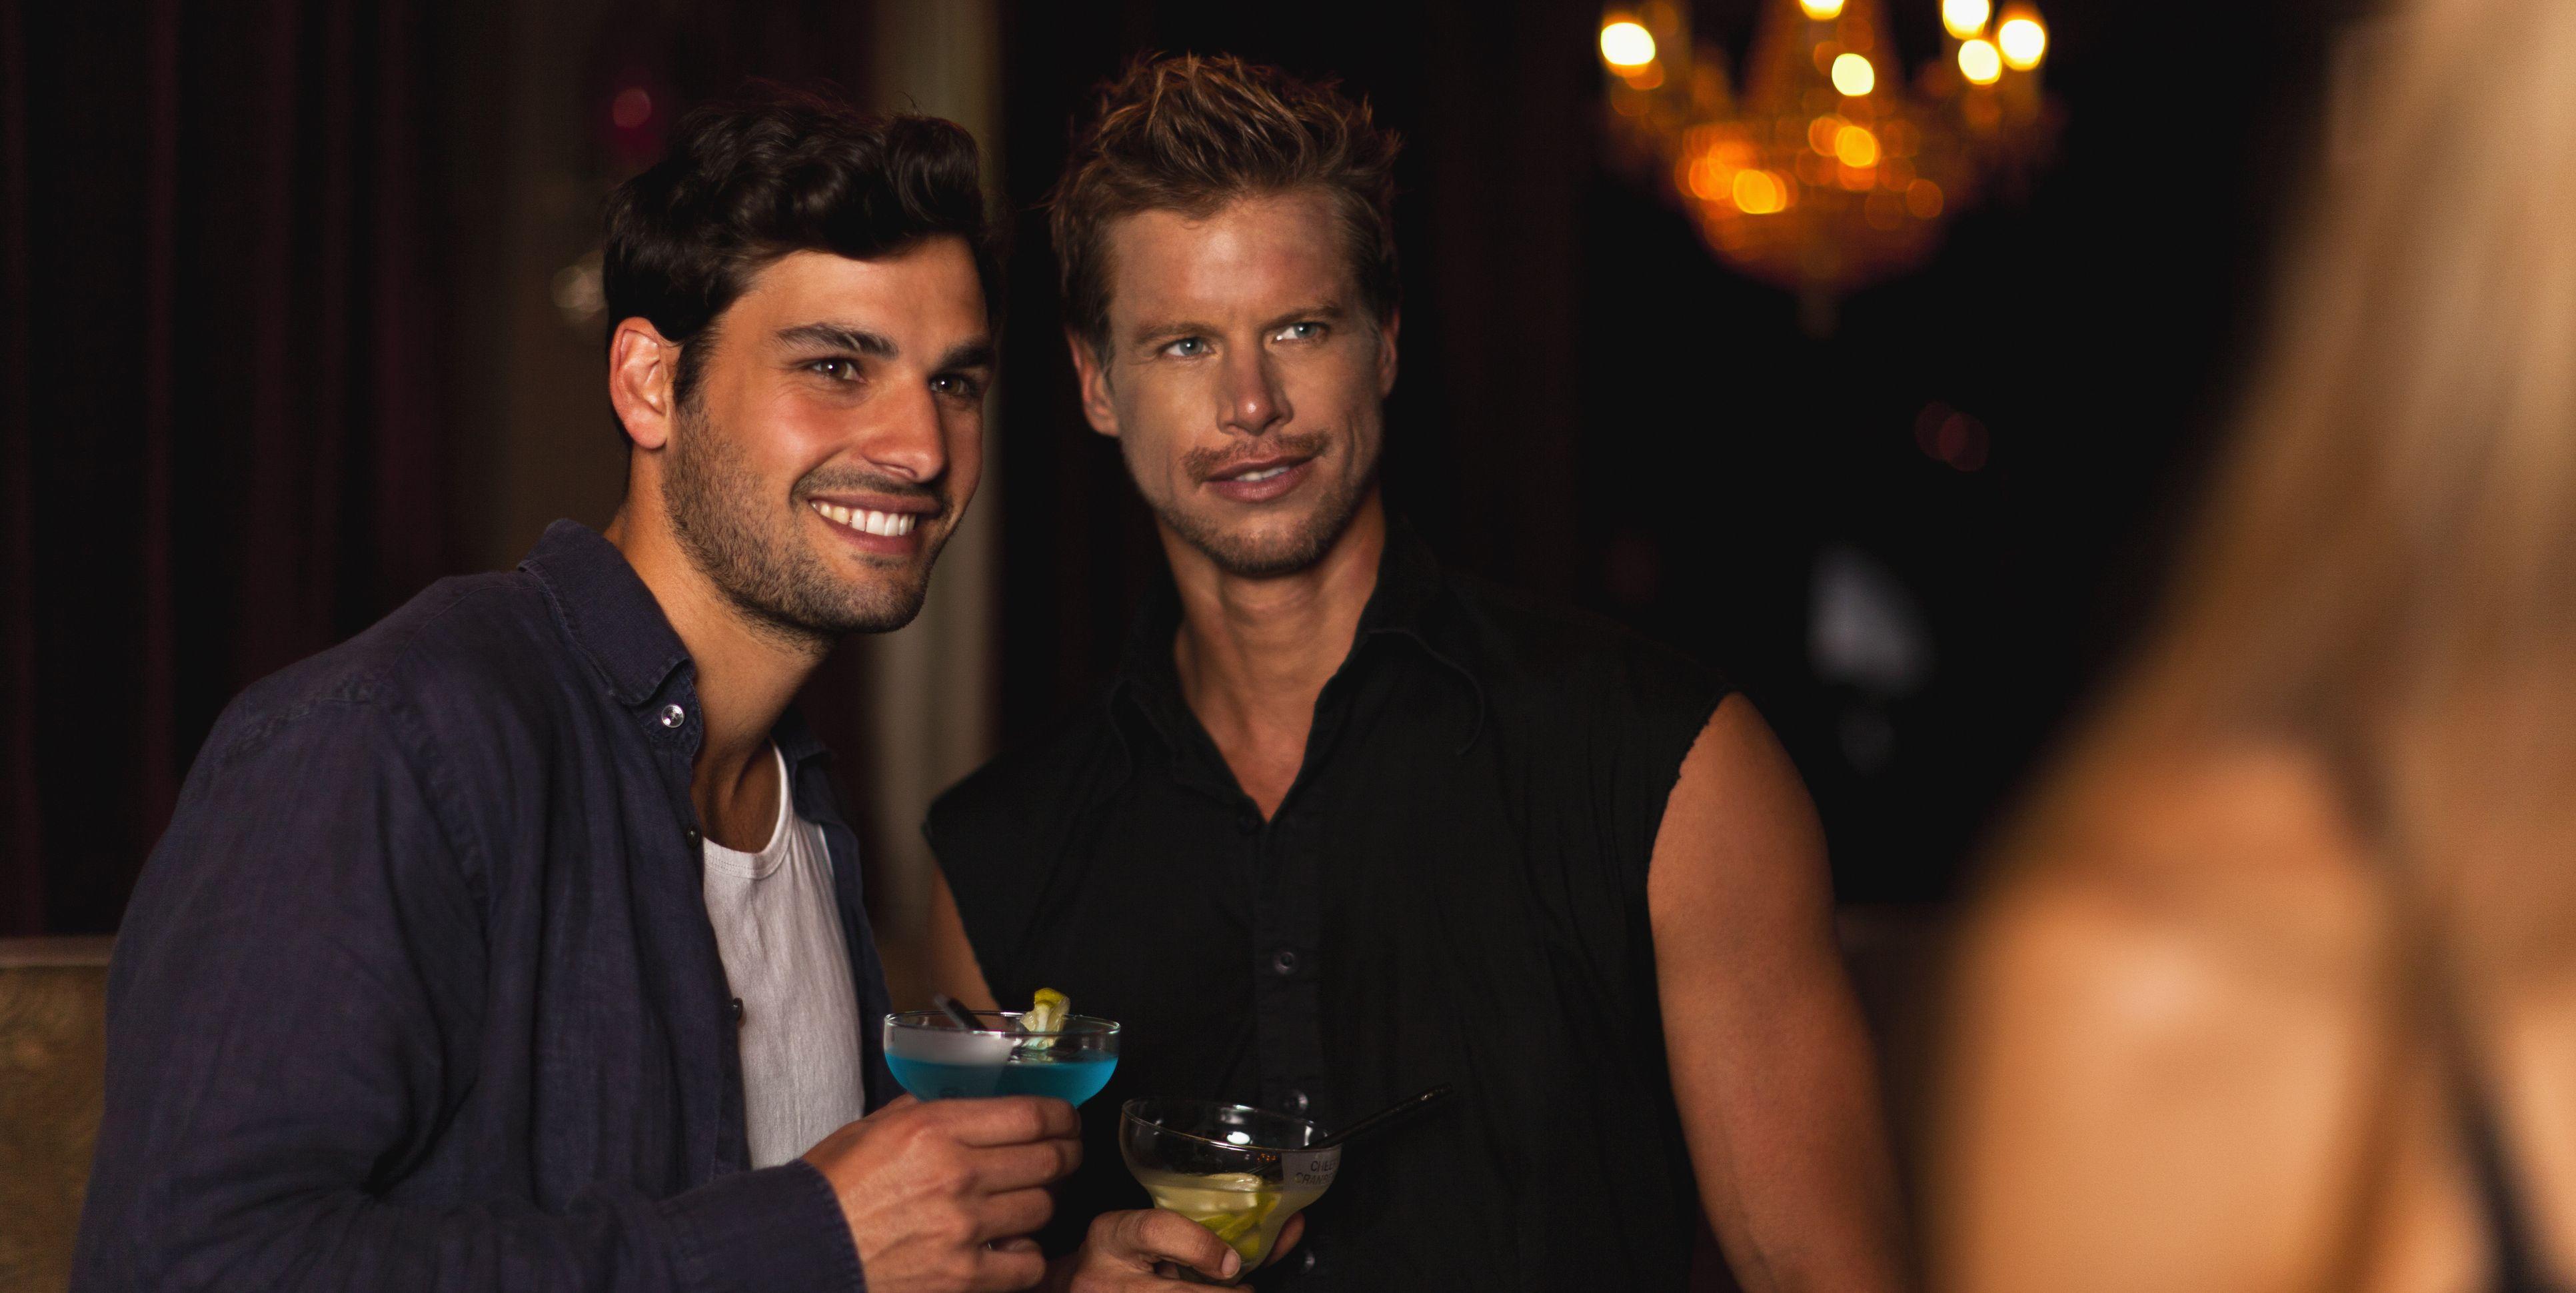 Smiling men having cocktails in club